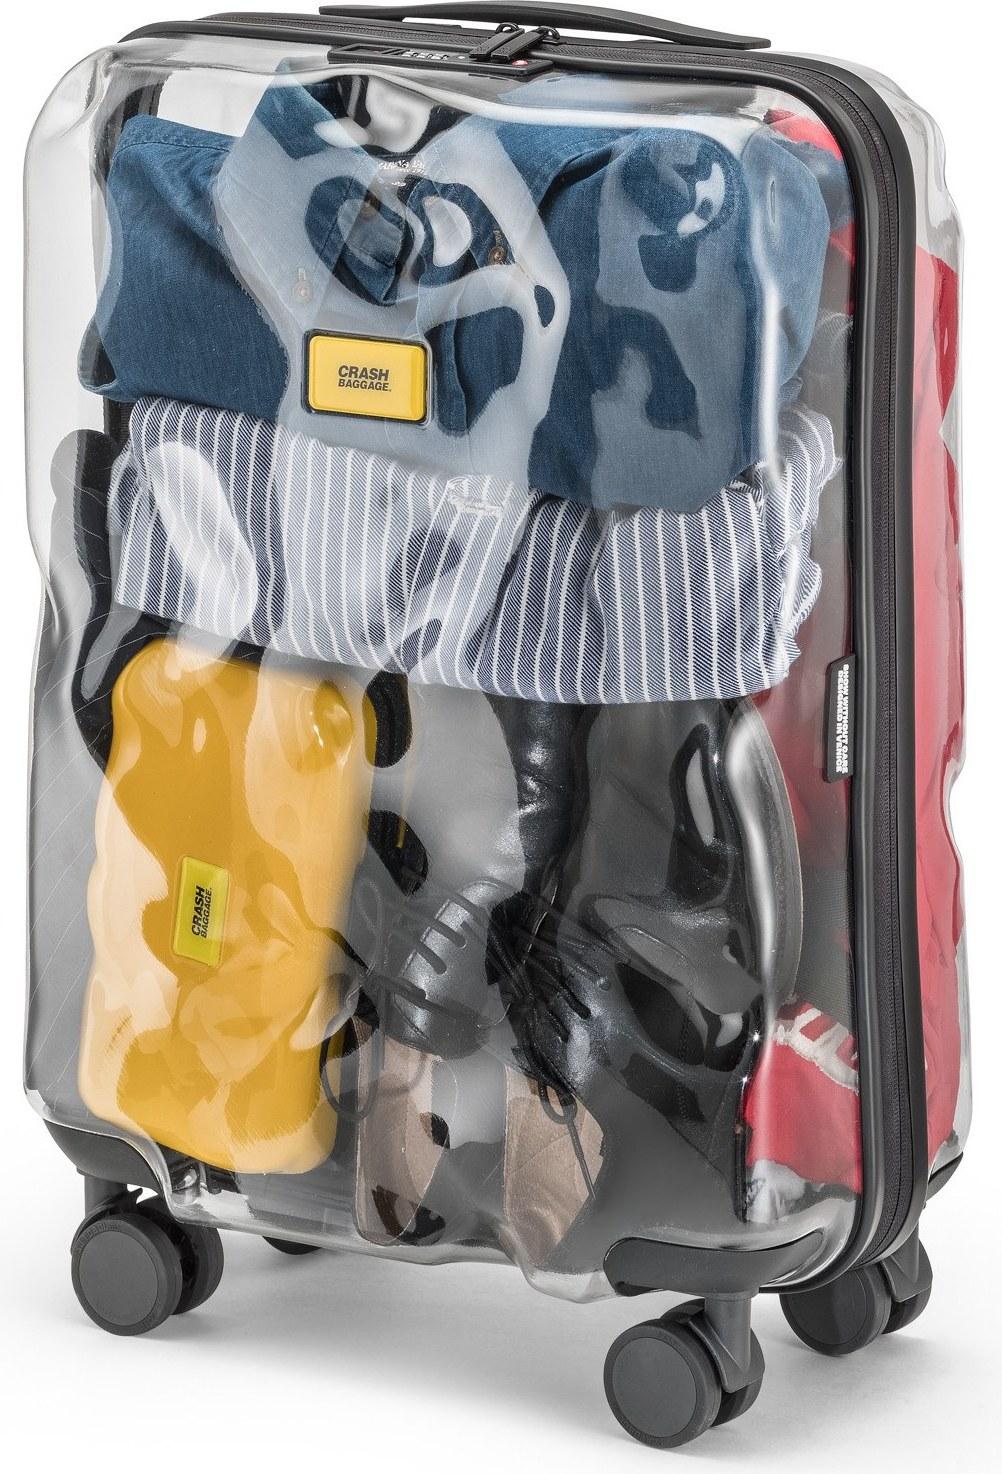 5226e3017c504 Walizka Share Transparent - Crash Baggage CB141.50 | Fabryka Form